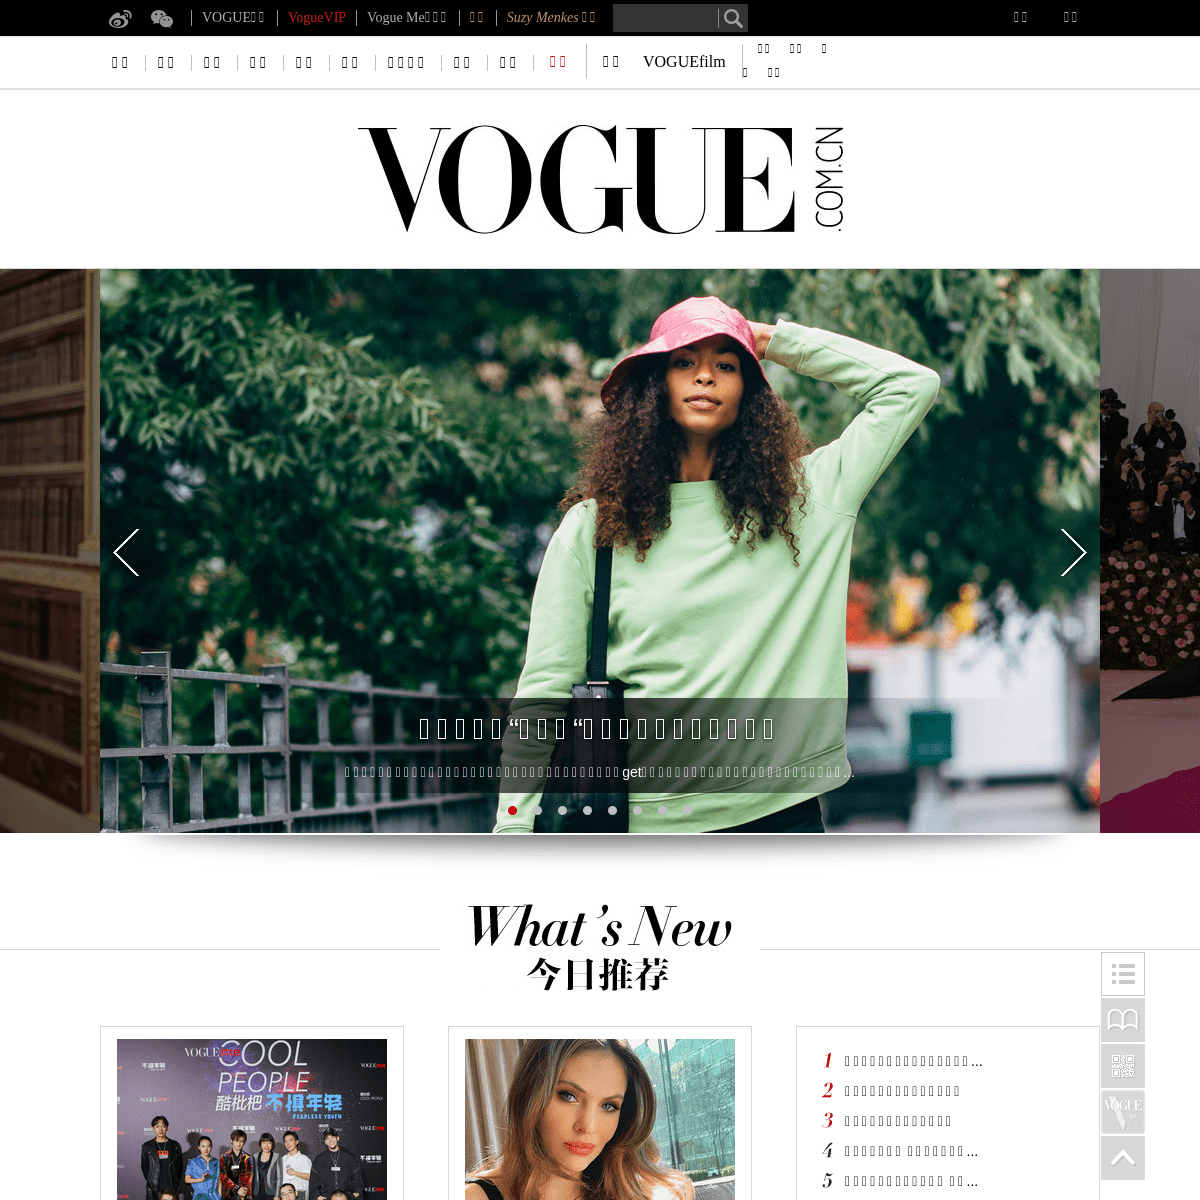 VOGUE时尚网_潮流领袖,时尚宝典 - 国际权威时尚媒体《VOGUE服饰与美容》杂志官网